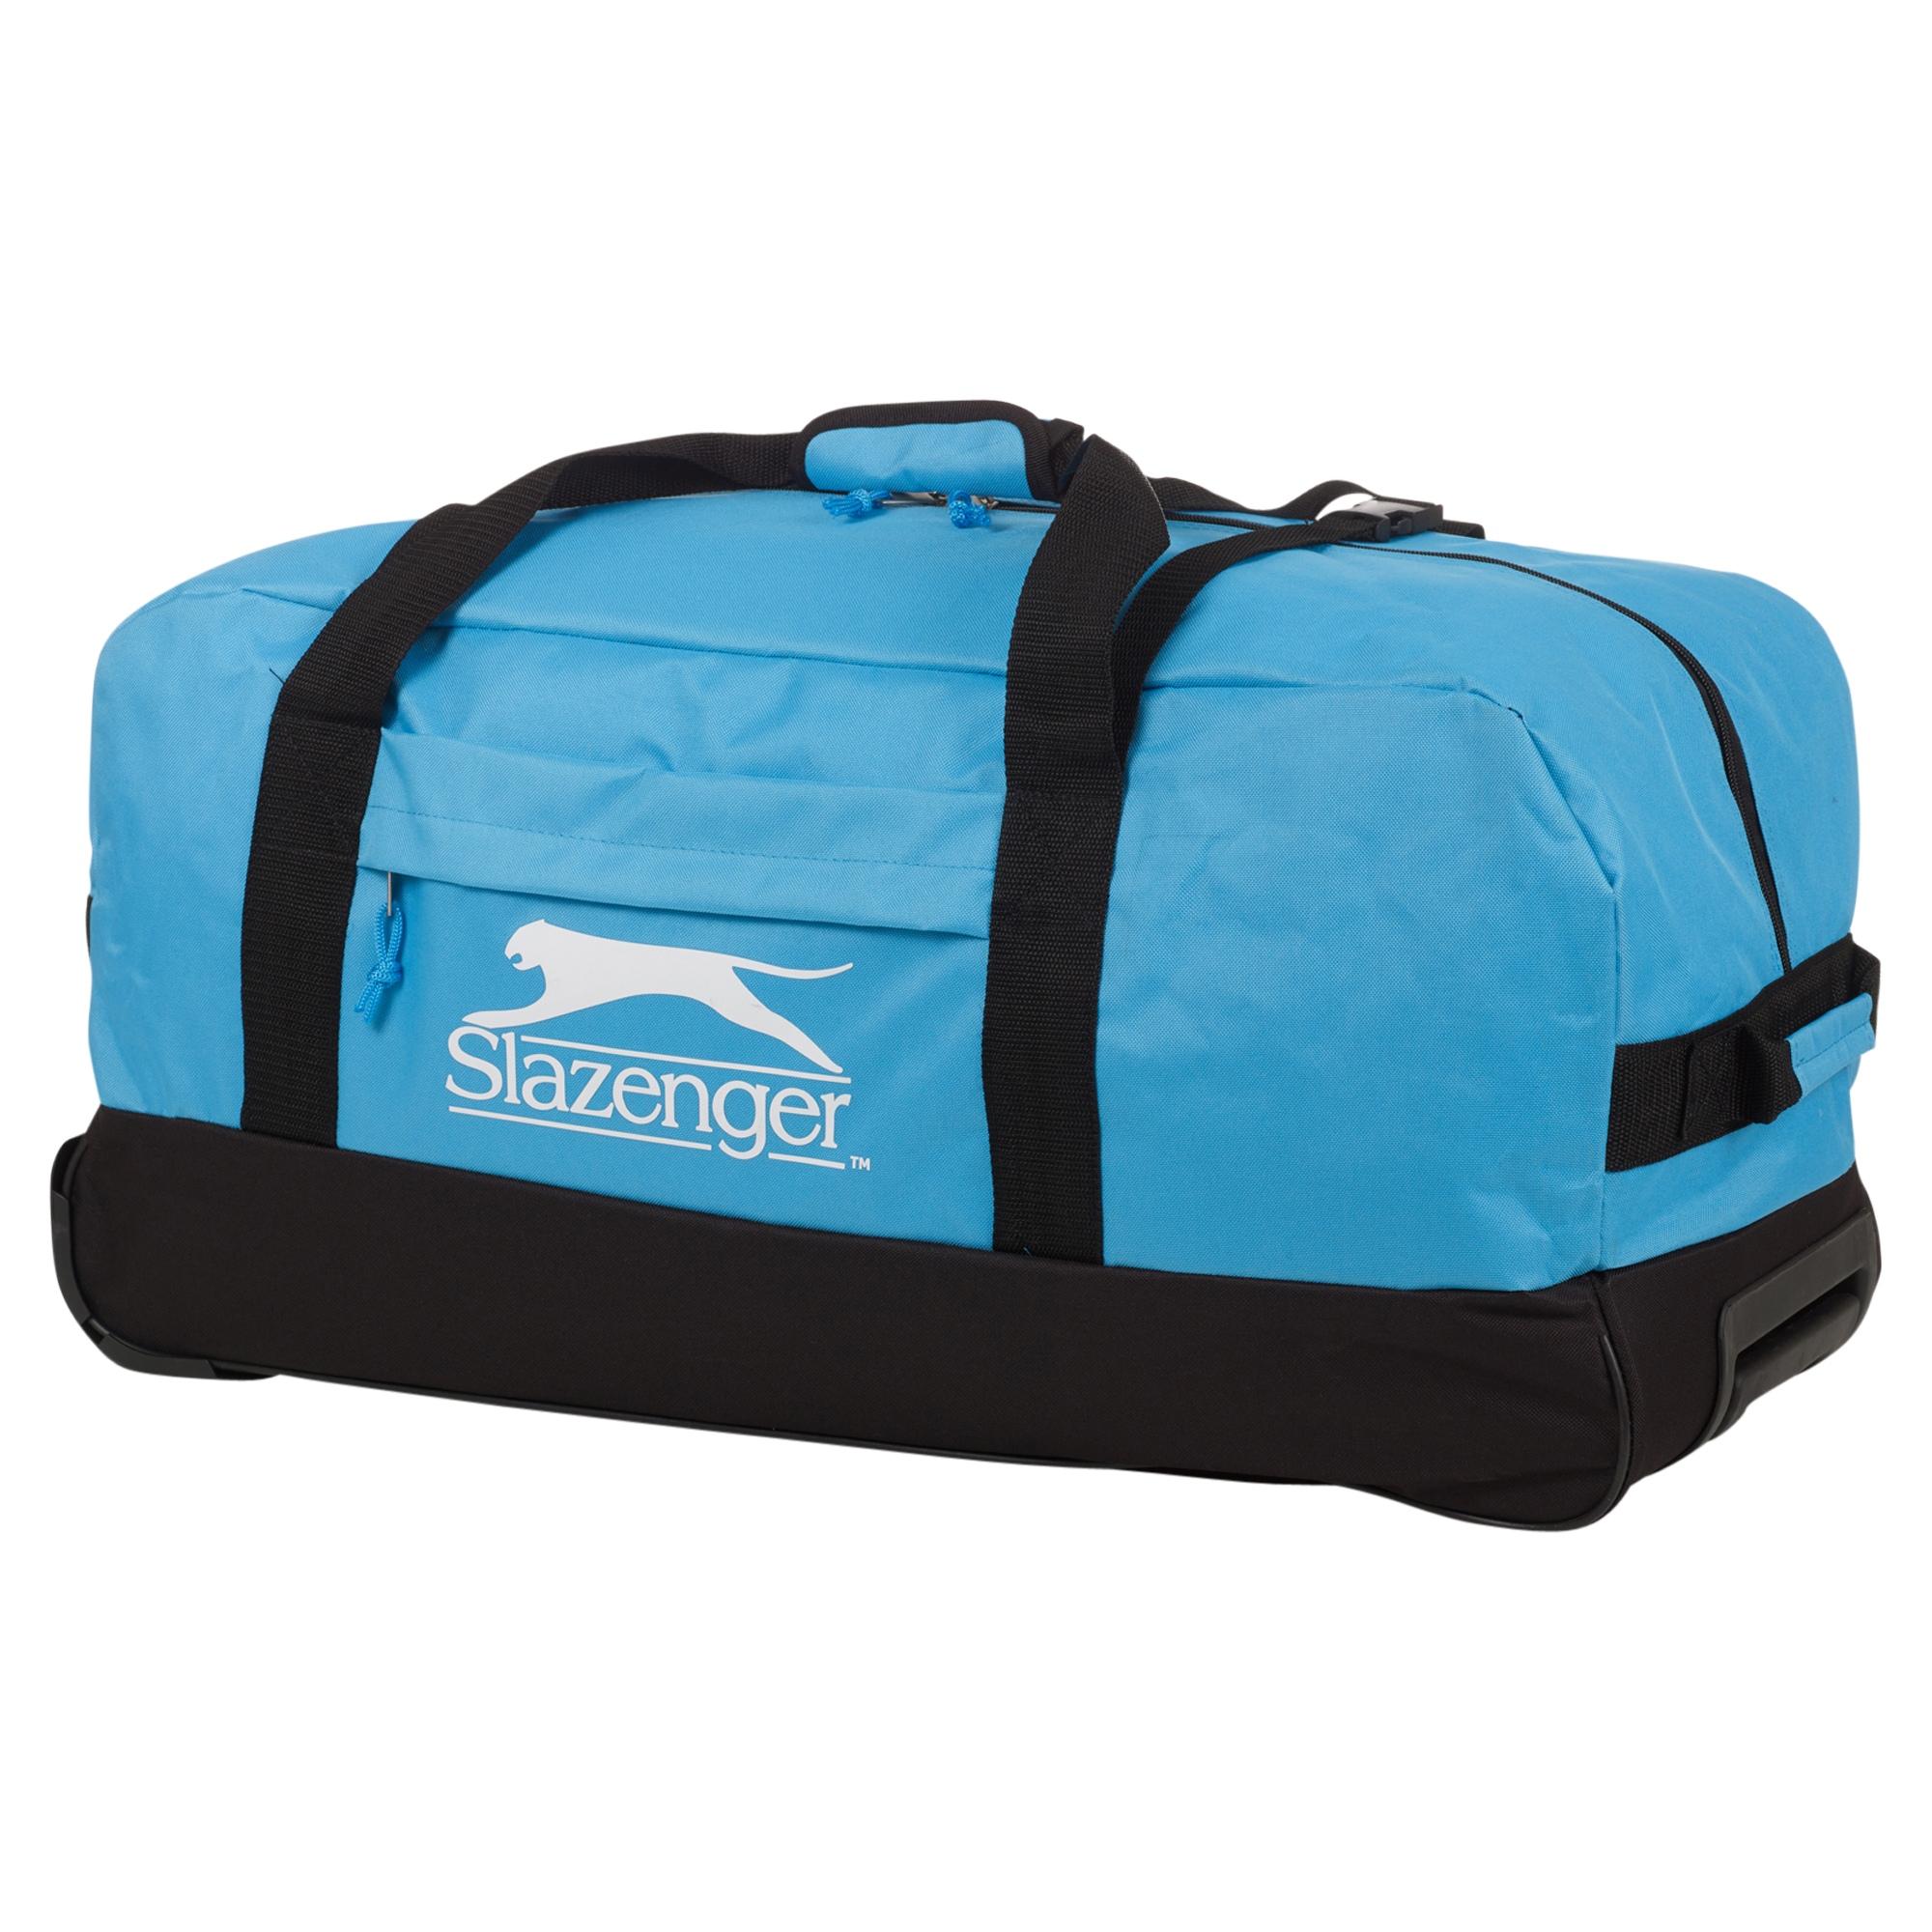 Slazenger Trolley Sports Travel Bag Handle Wheels Luggage Carry